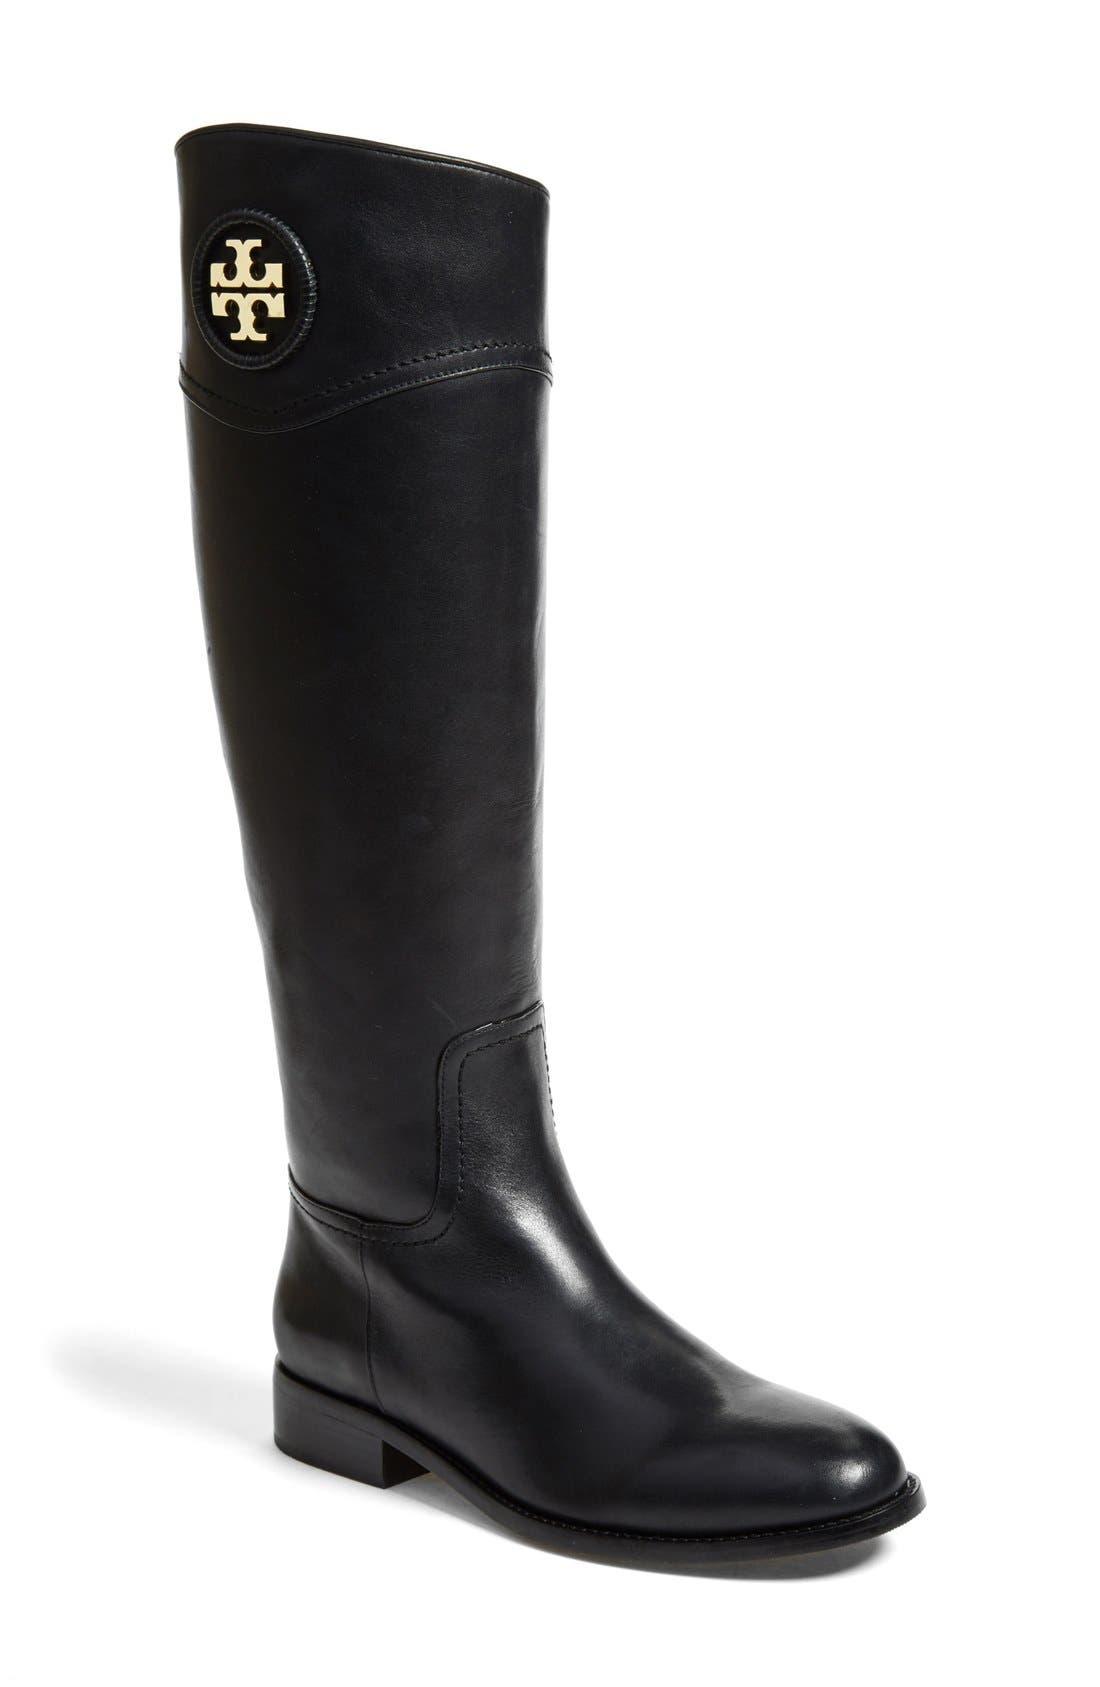 Main Image - Tory Burch 'Ashlynn' Wide Calf Riding Boot (Women)